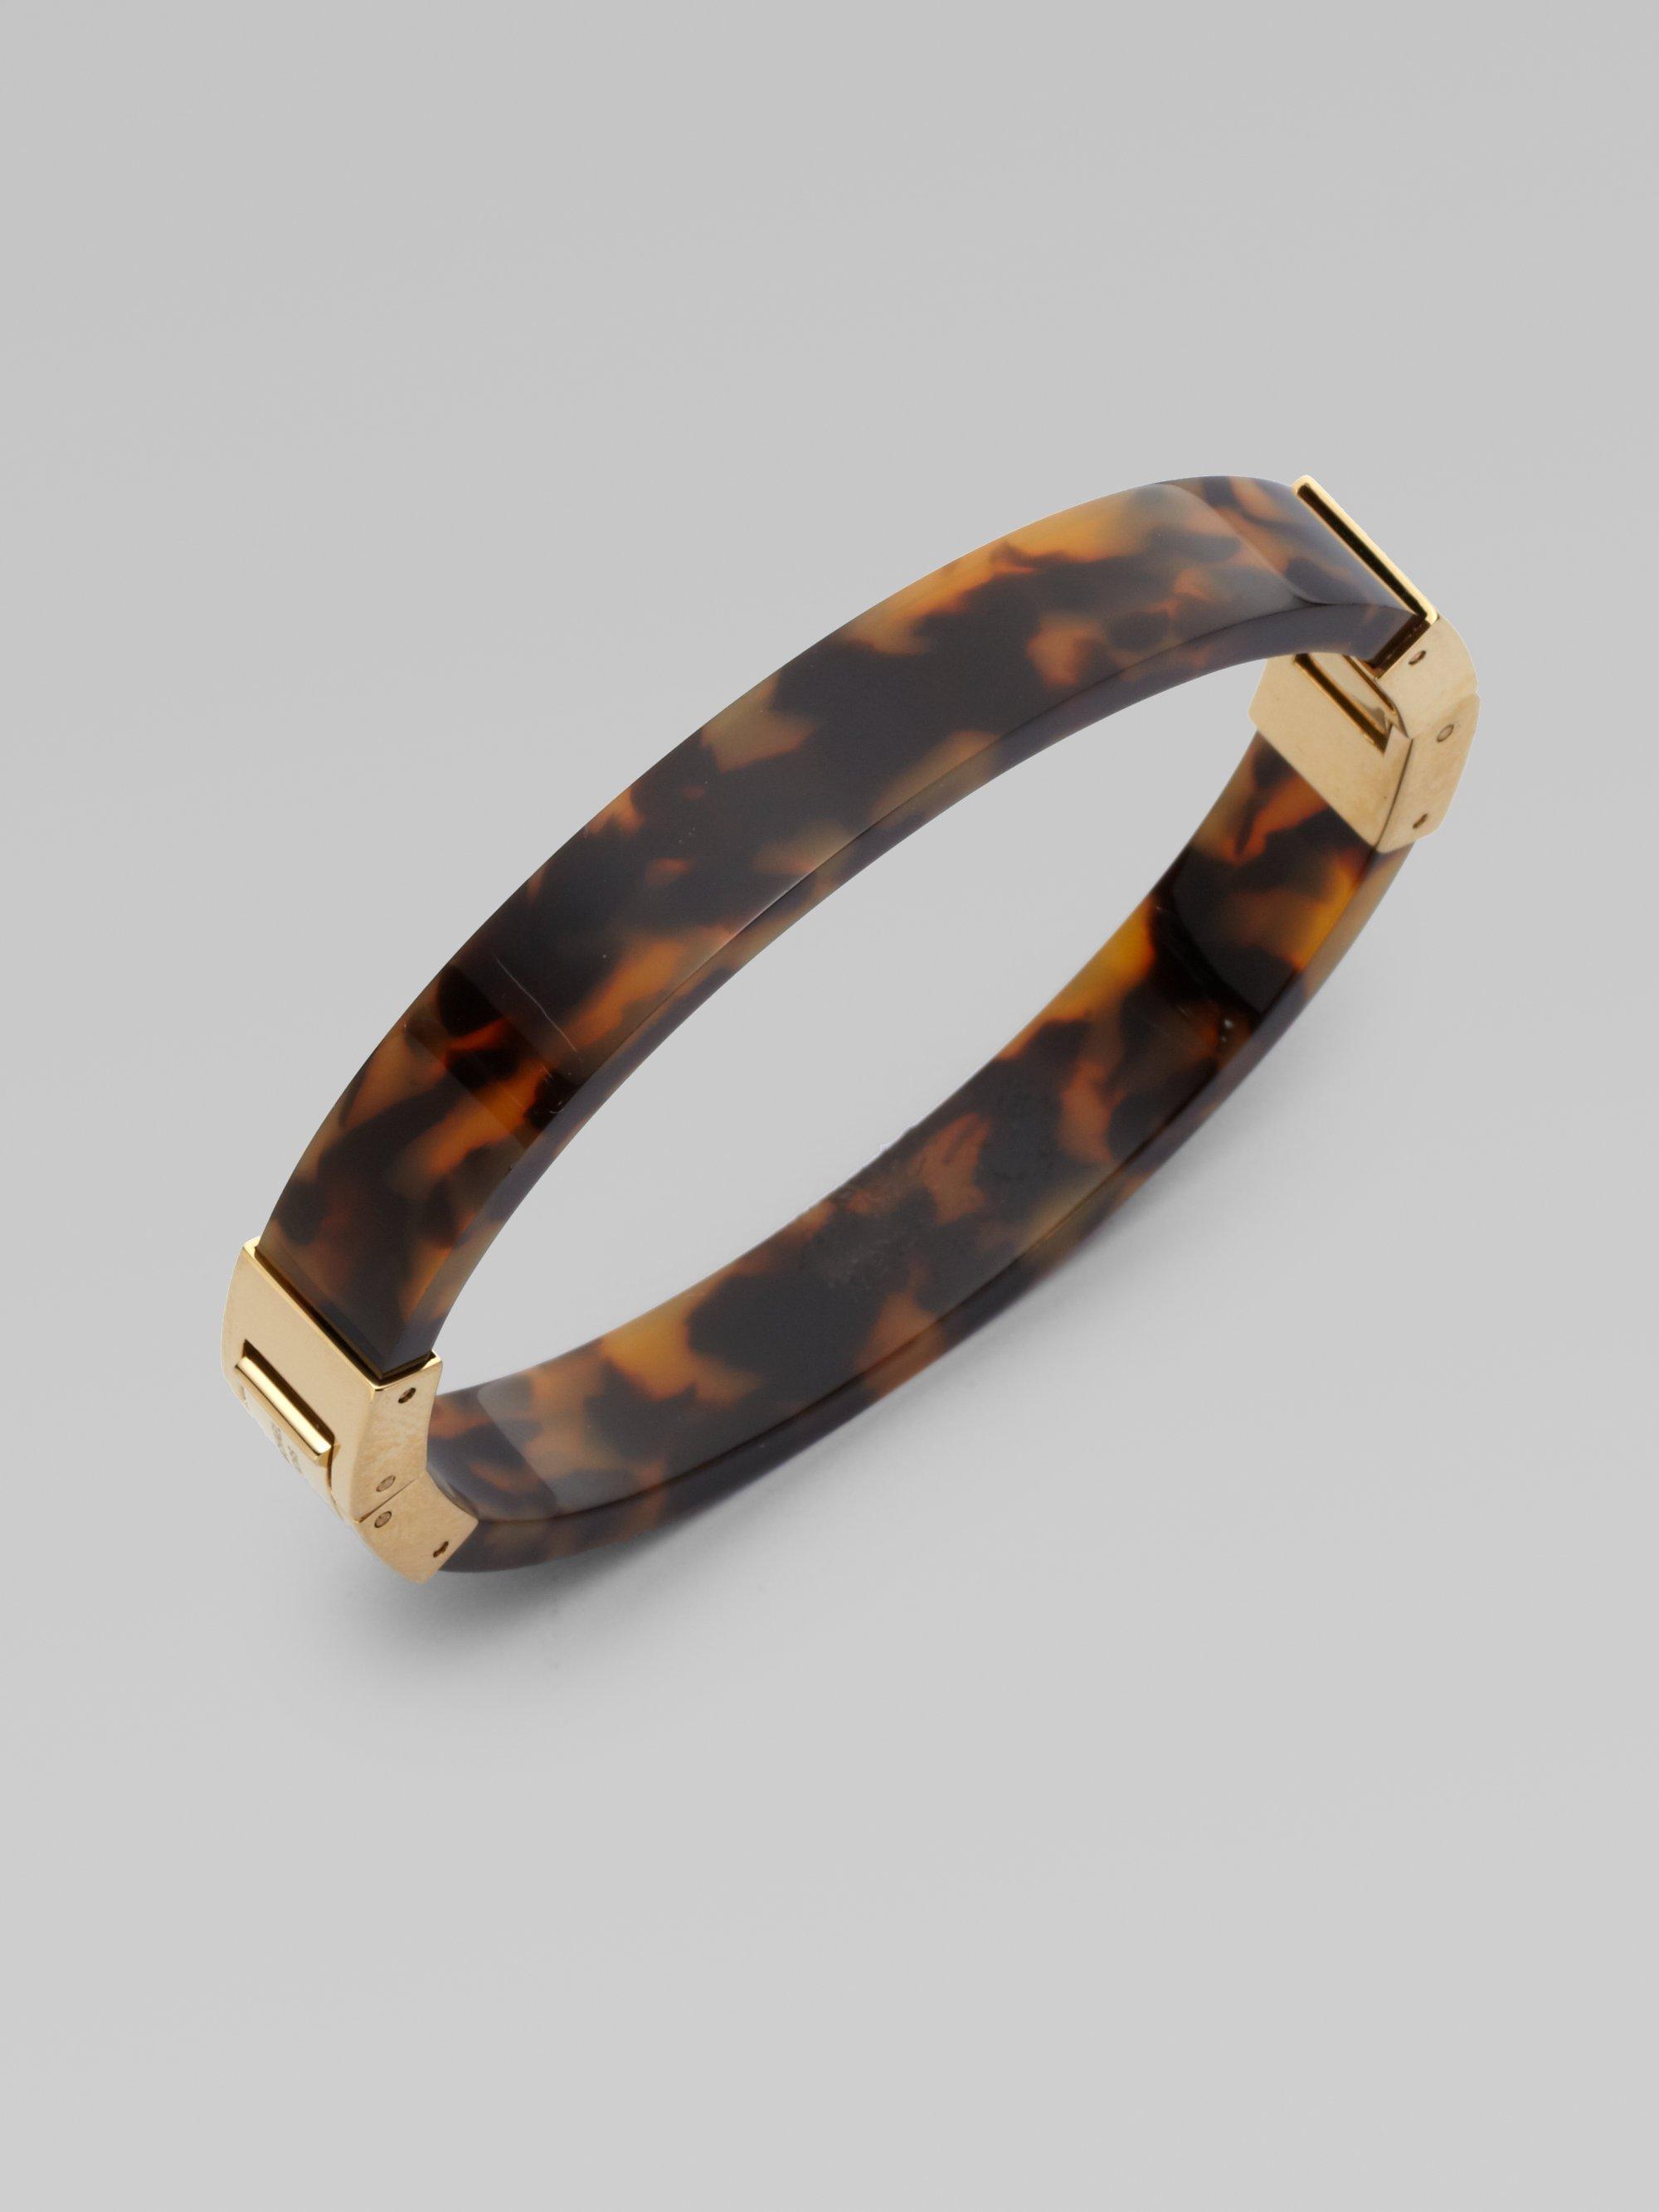 michael kors tortoise print resin bangle bracelet in brown. Black Bedroom Furniture Sets. Home Design Ideas